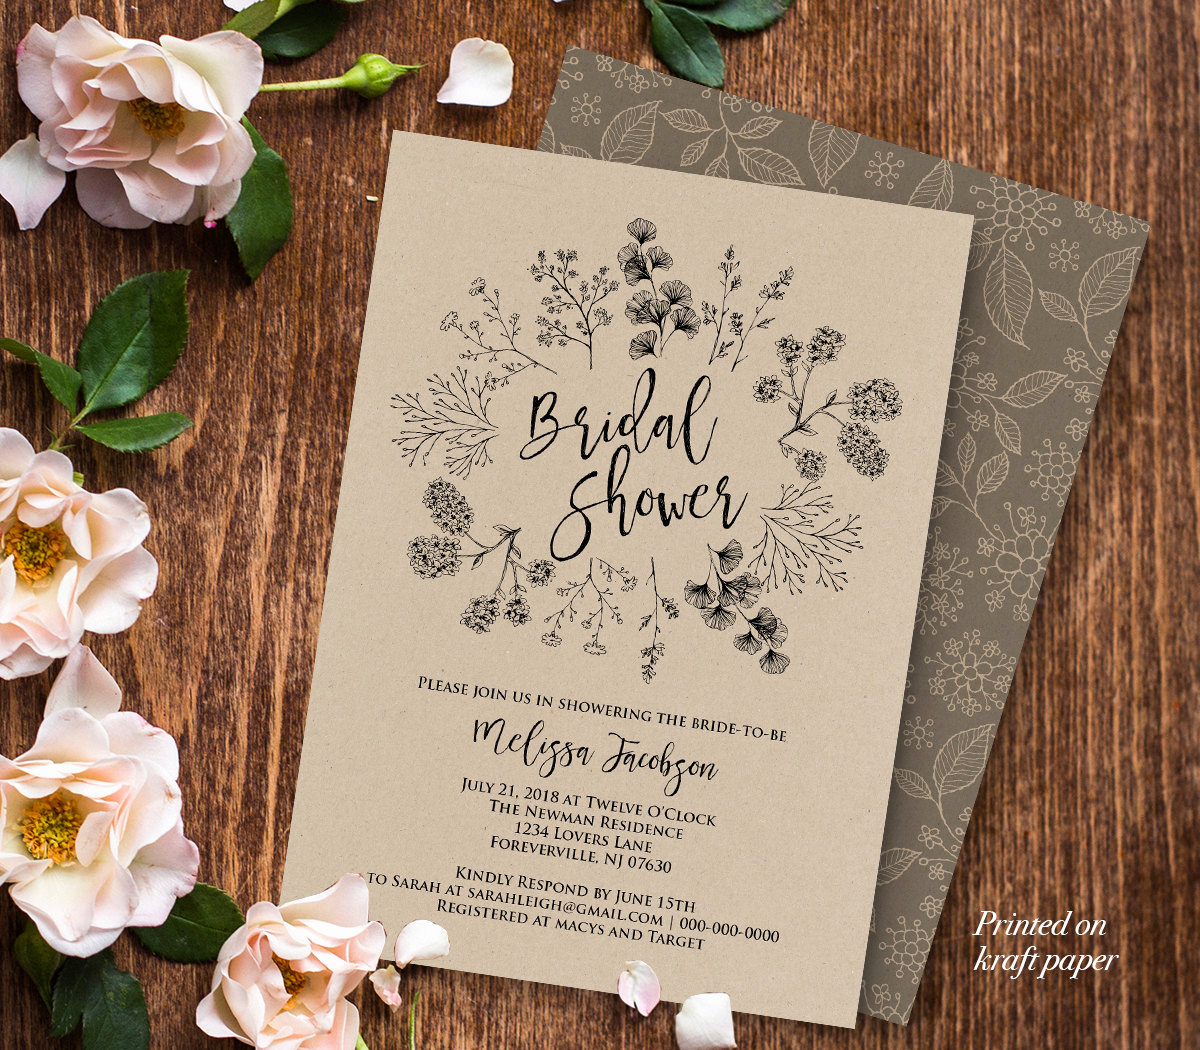 Wedding Shower Invitation Template Beautiful Rustic Bridal Shower Invitation Template Wedding Shower